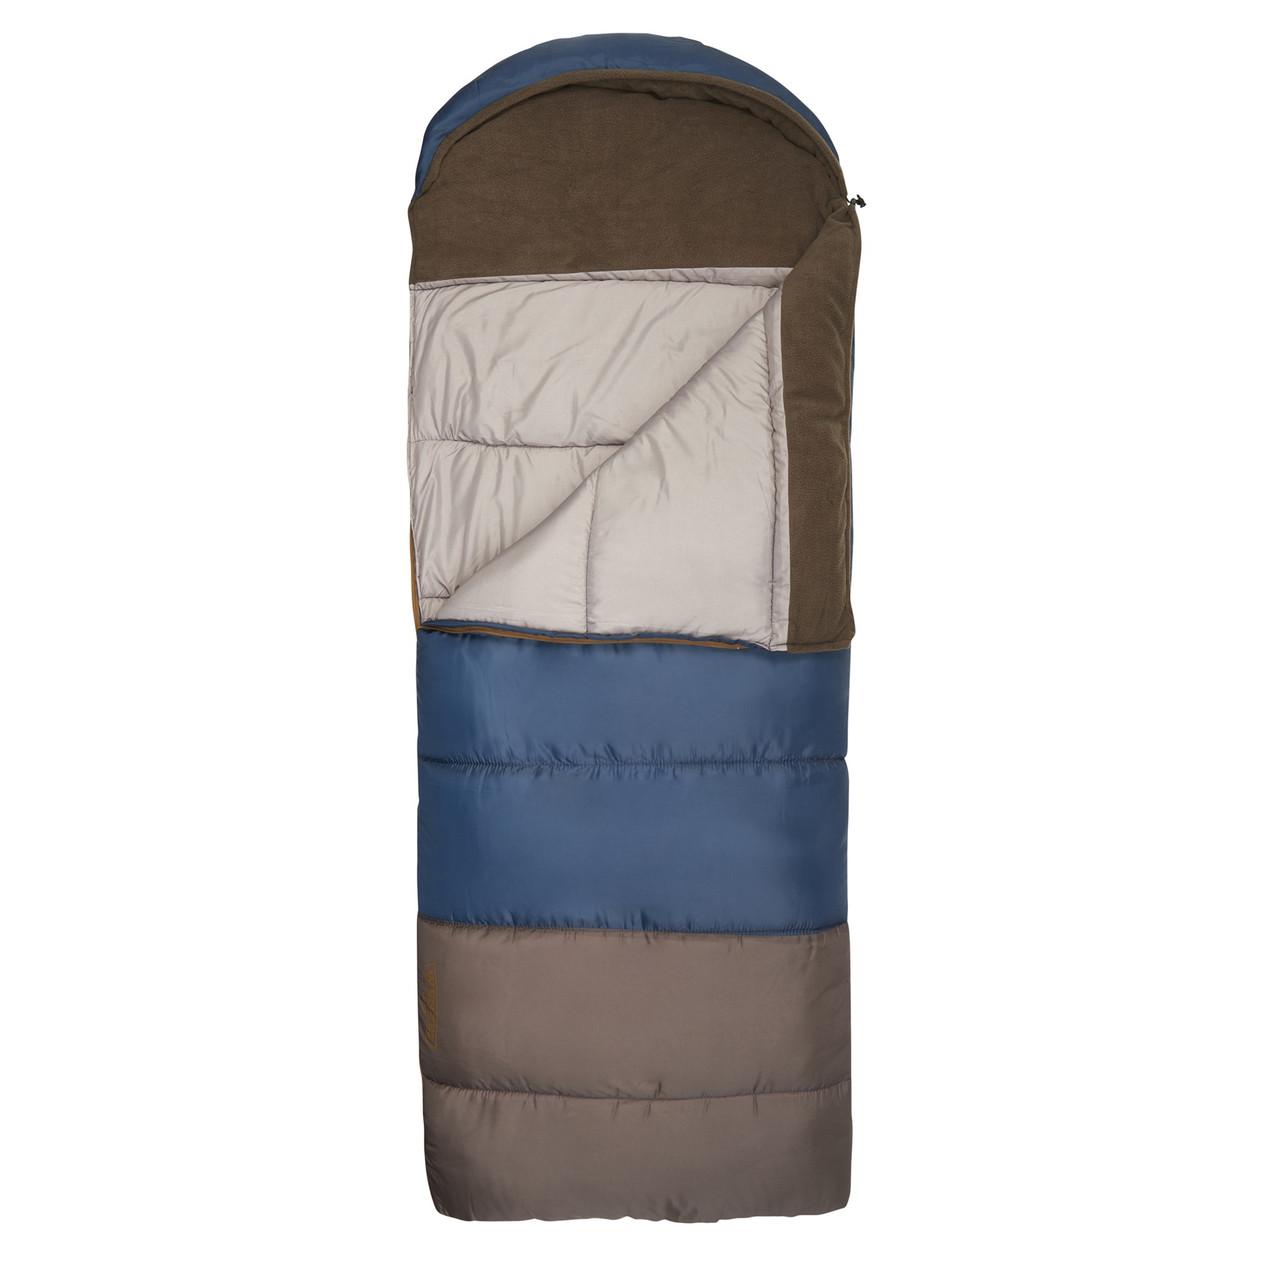 Wenzel Monterey Sleeping Bag, blue, shown partially unzipped